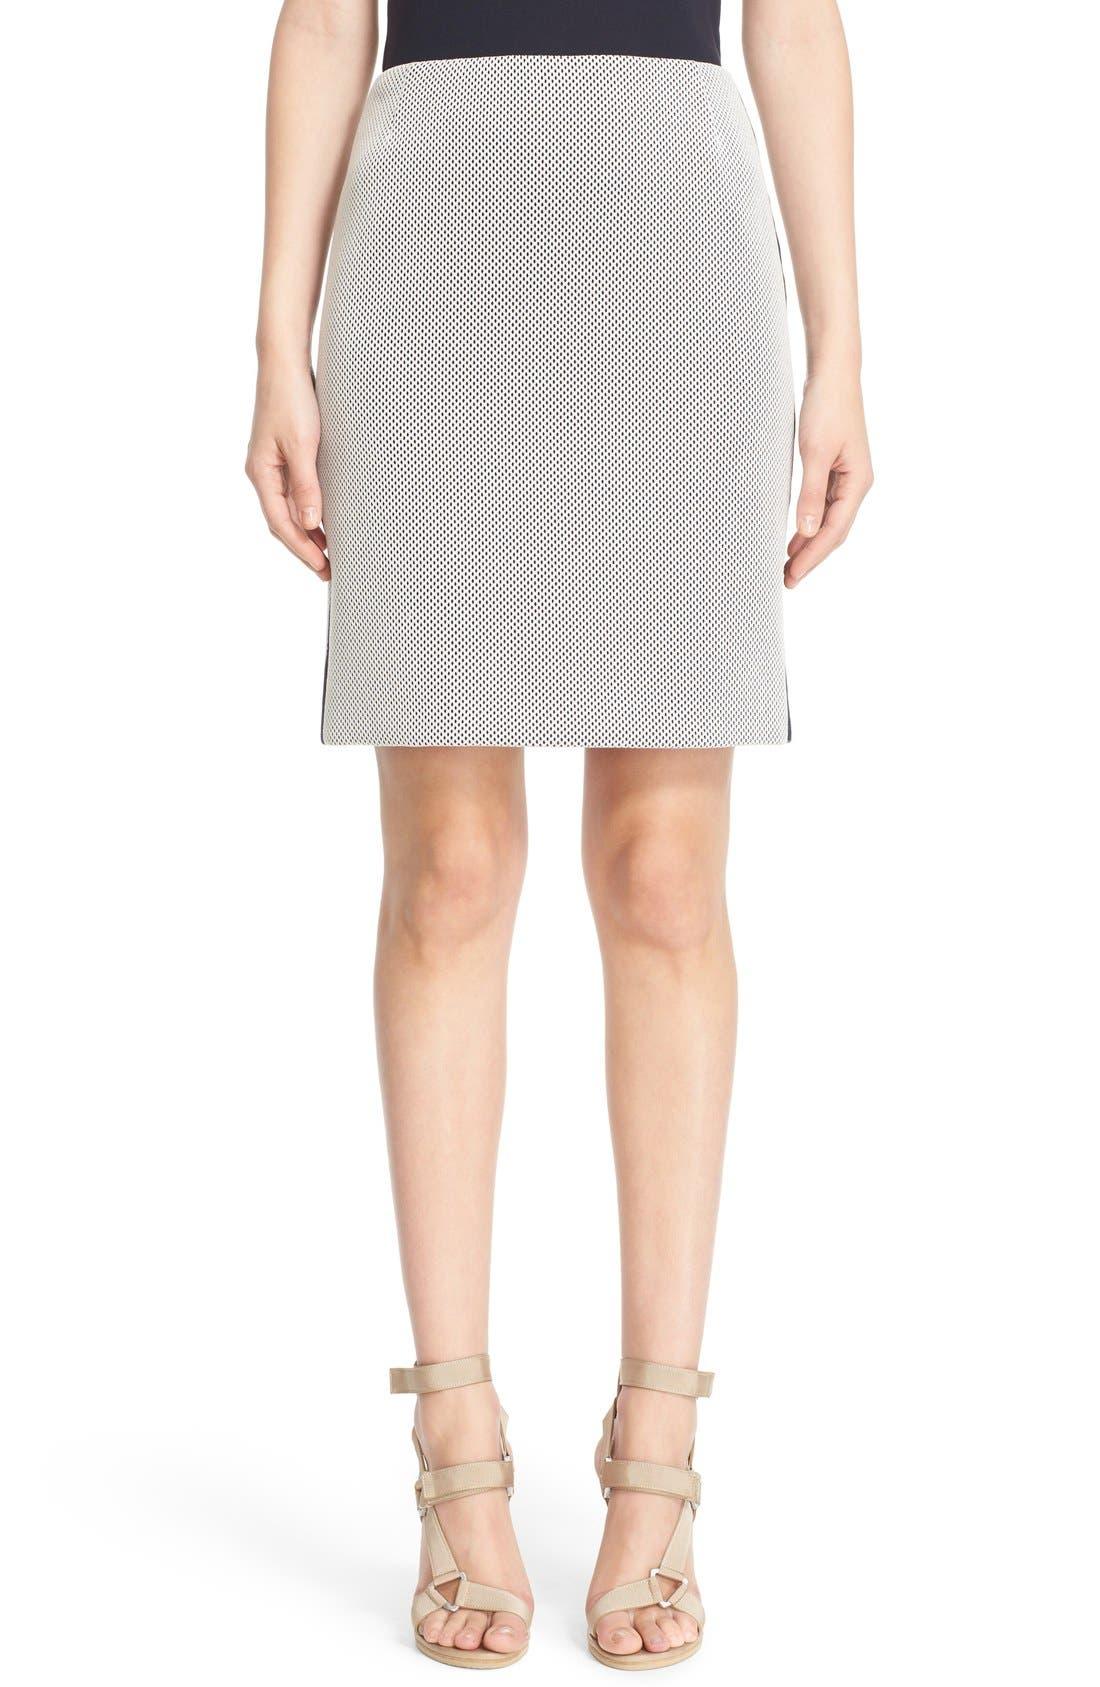 AKRIS PUNTO, Side Stripe Mesh Pencil Skirt, Main thumbnail 1, color, 900